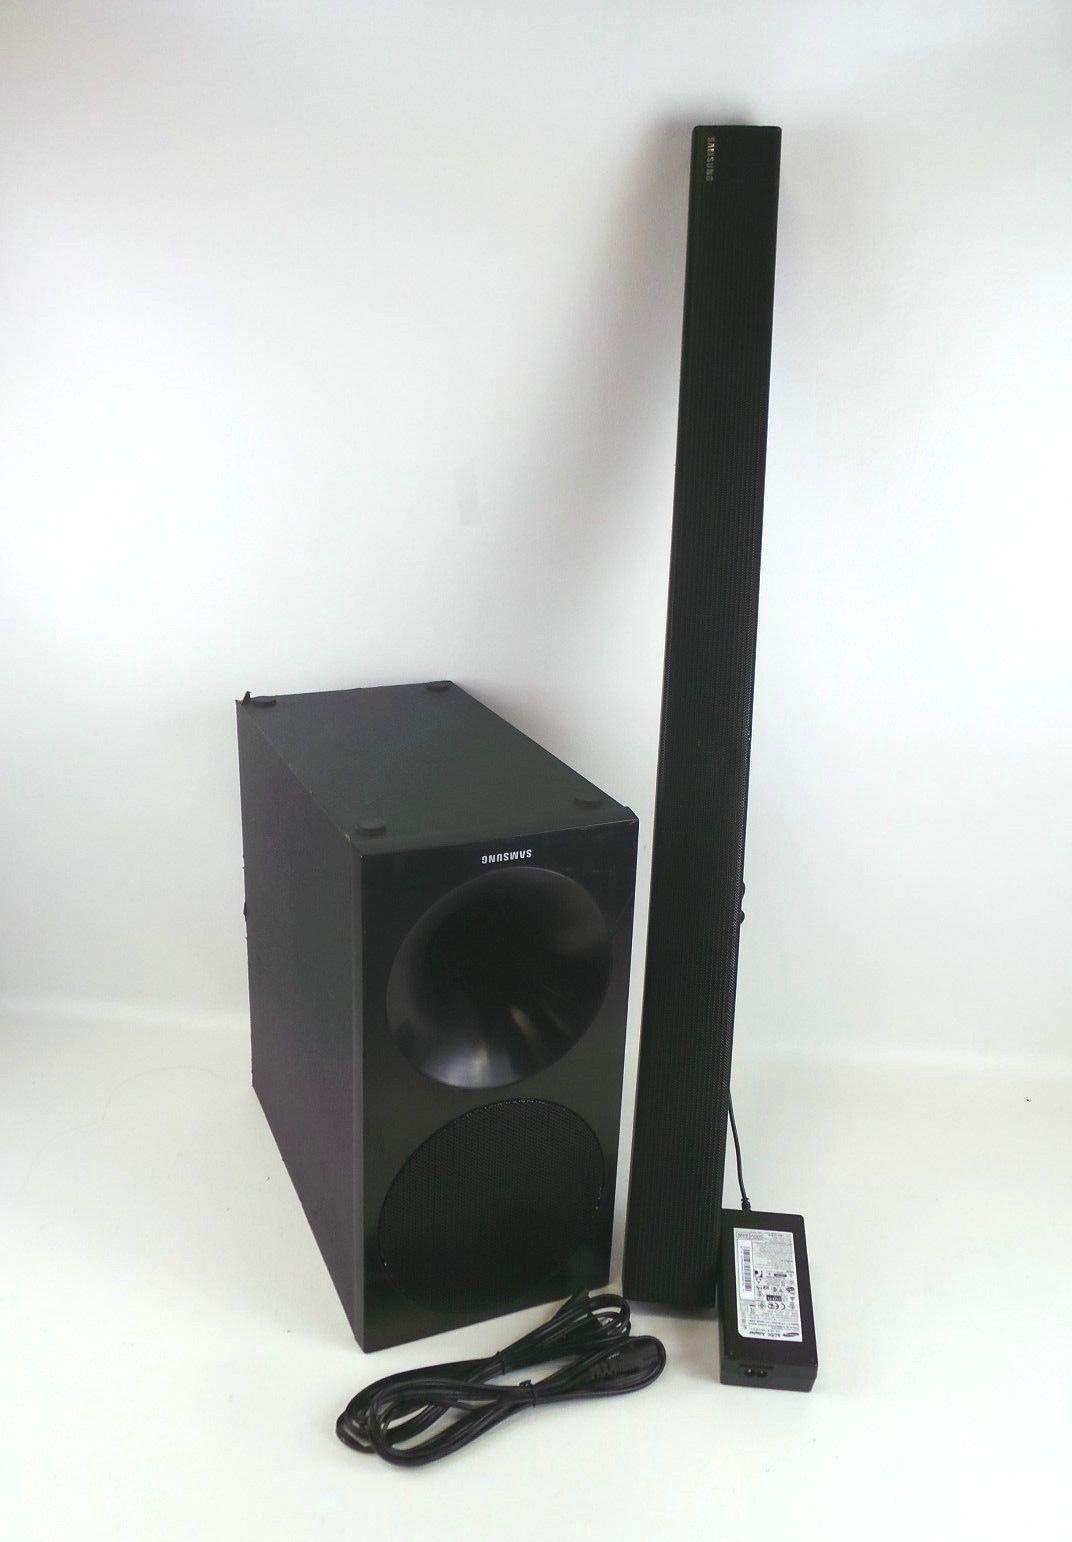 68 04 Samsung Soundbar Samsung Hw M450 W Ps Wm30 Wireless Subwoofer Chive Samsung Soundbar M450 Wm30 Wireless Subwoo Sound Bar Decor Home Decor